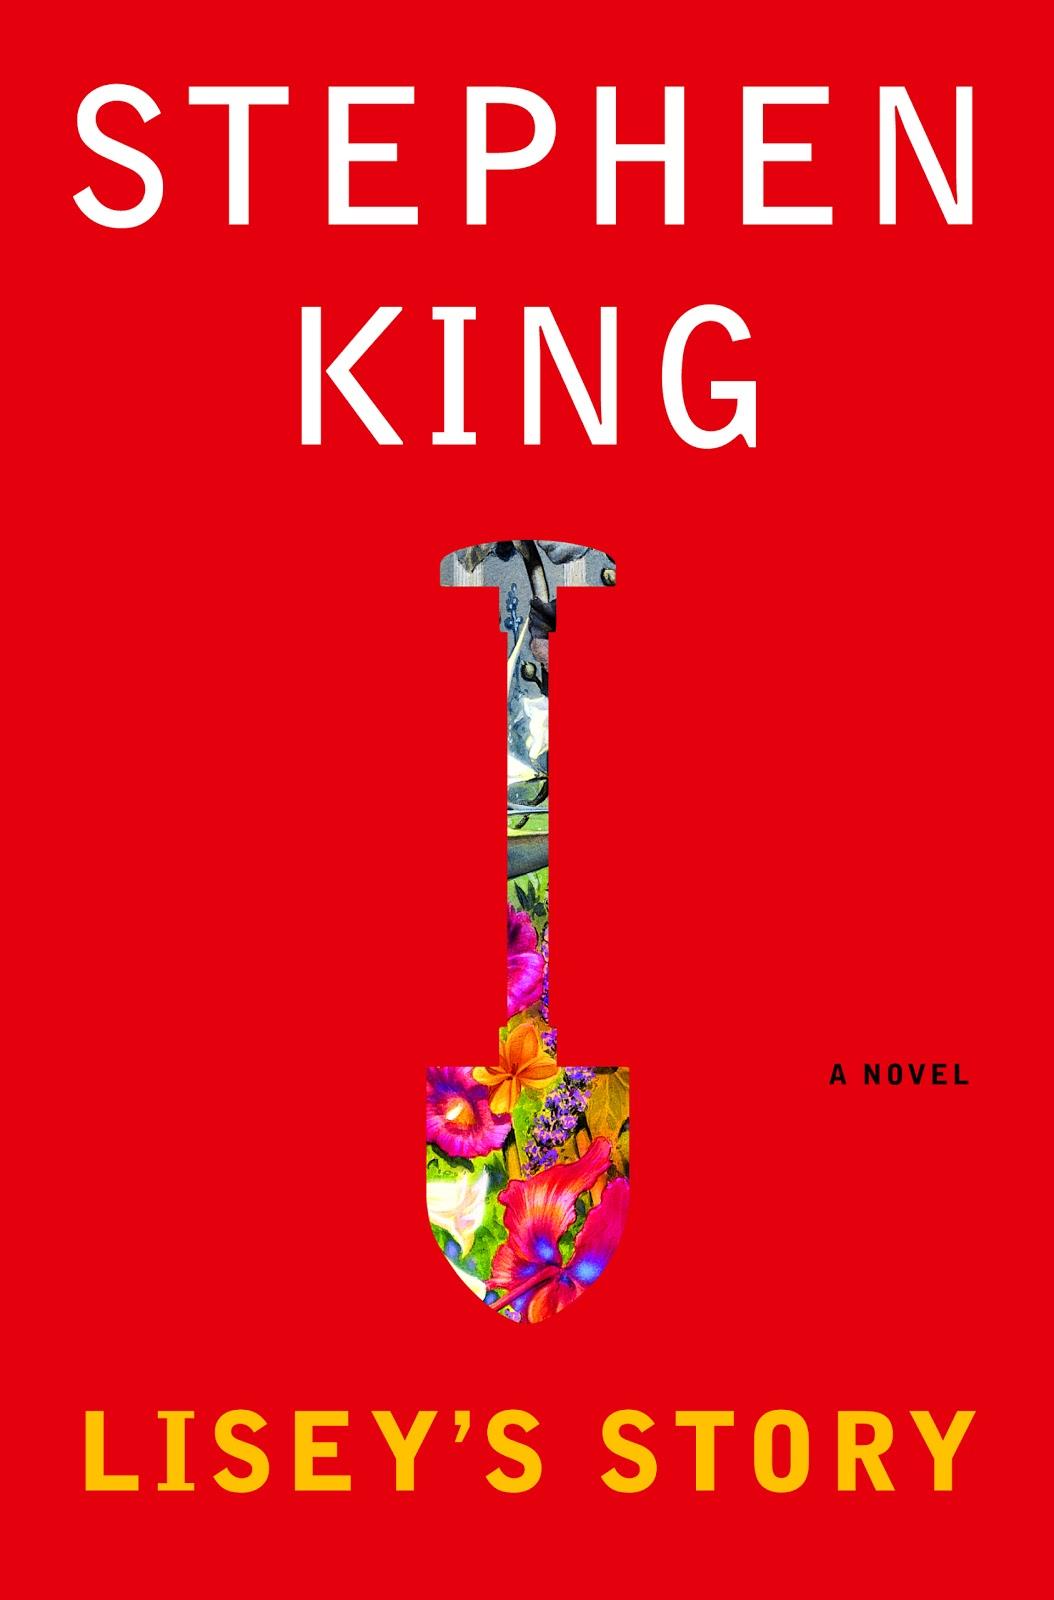 Stephen King will envy the nightmarish stories of real killer clowns 87